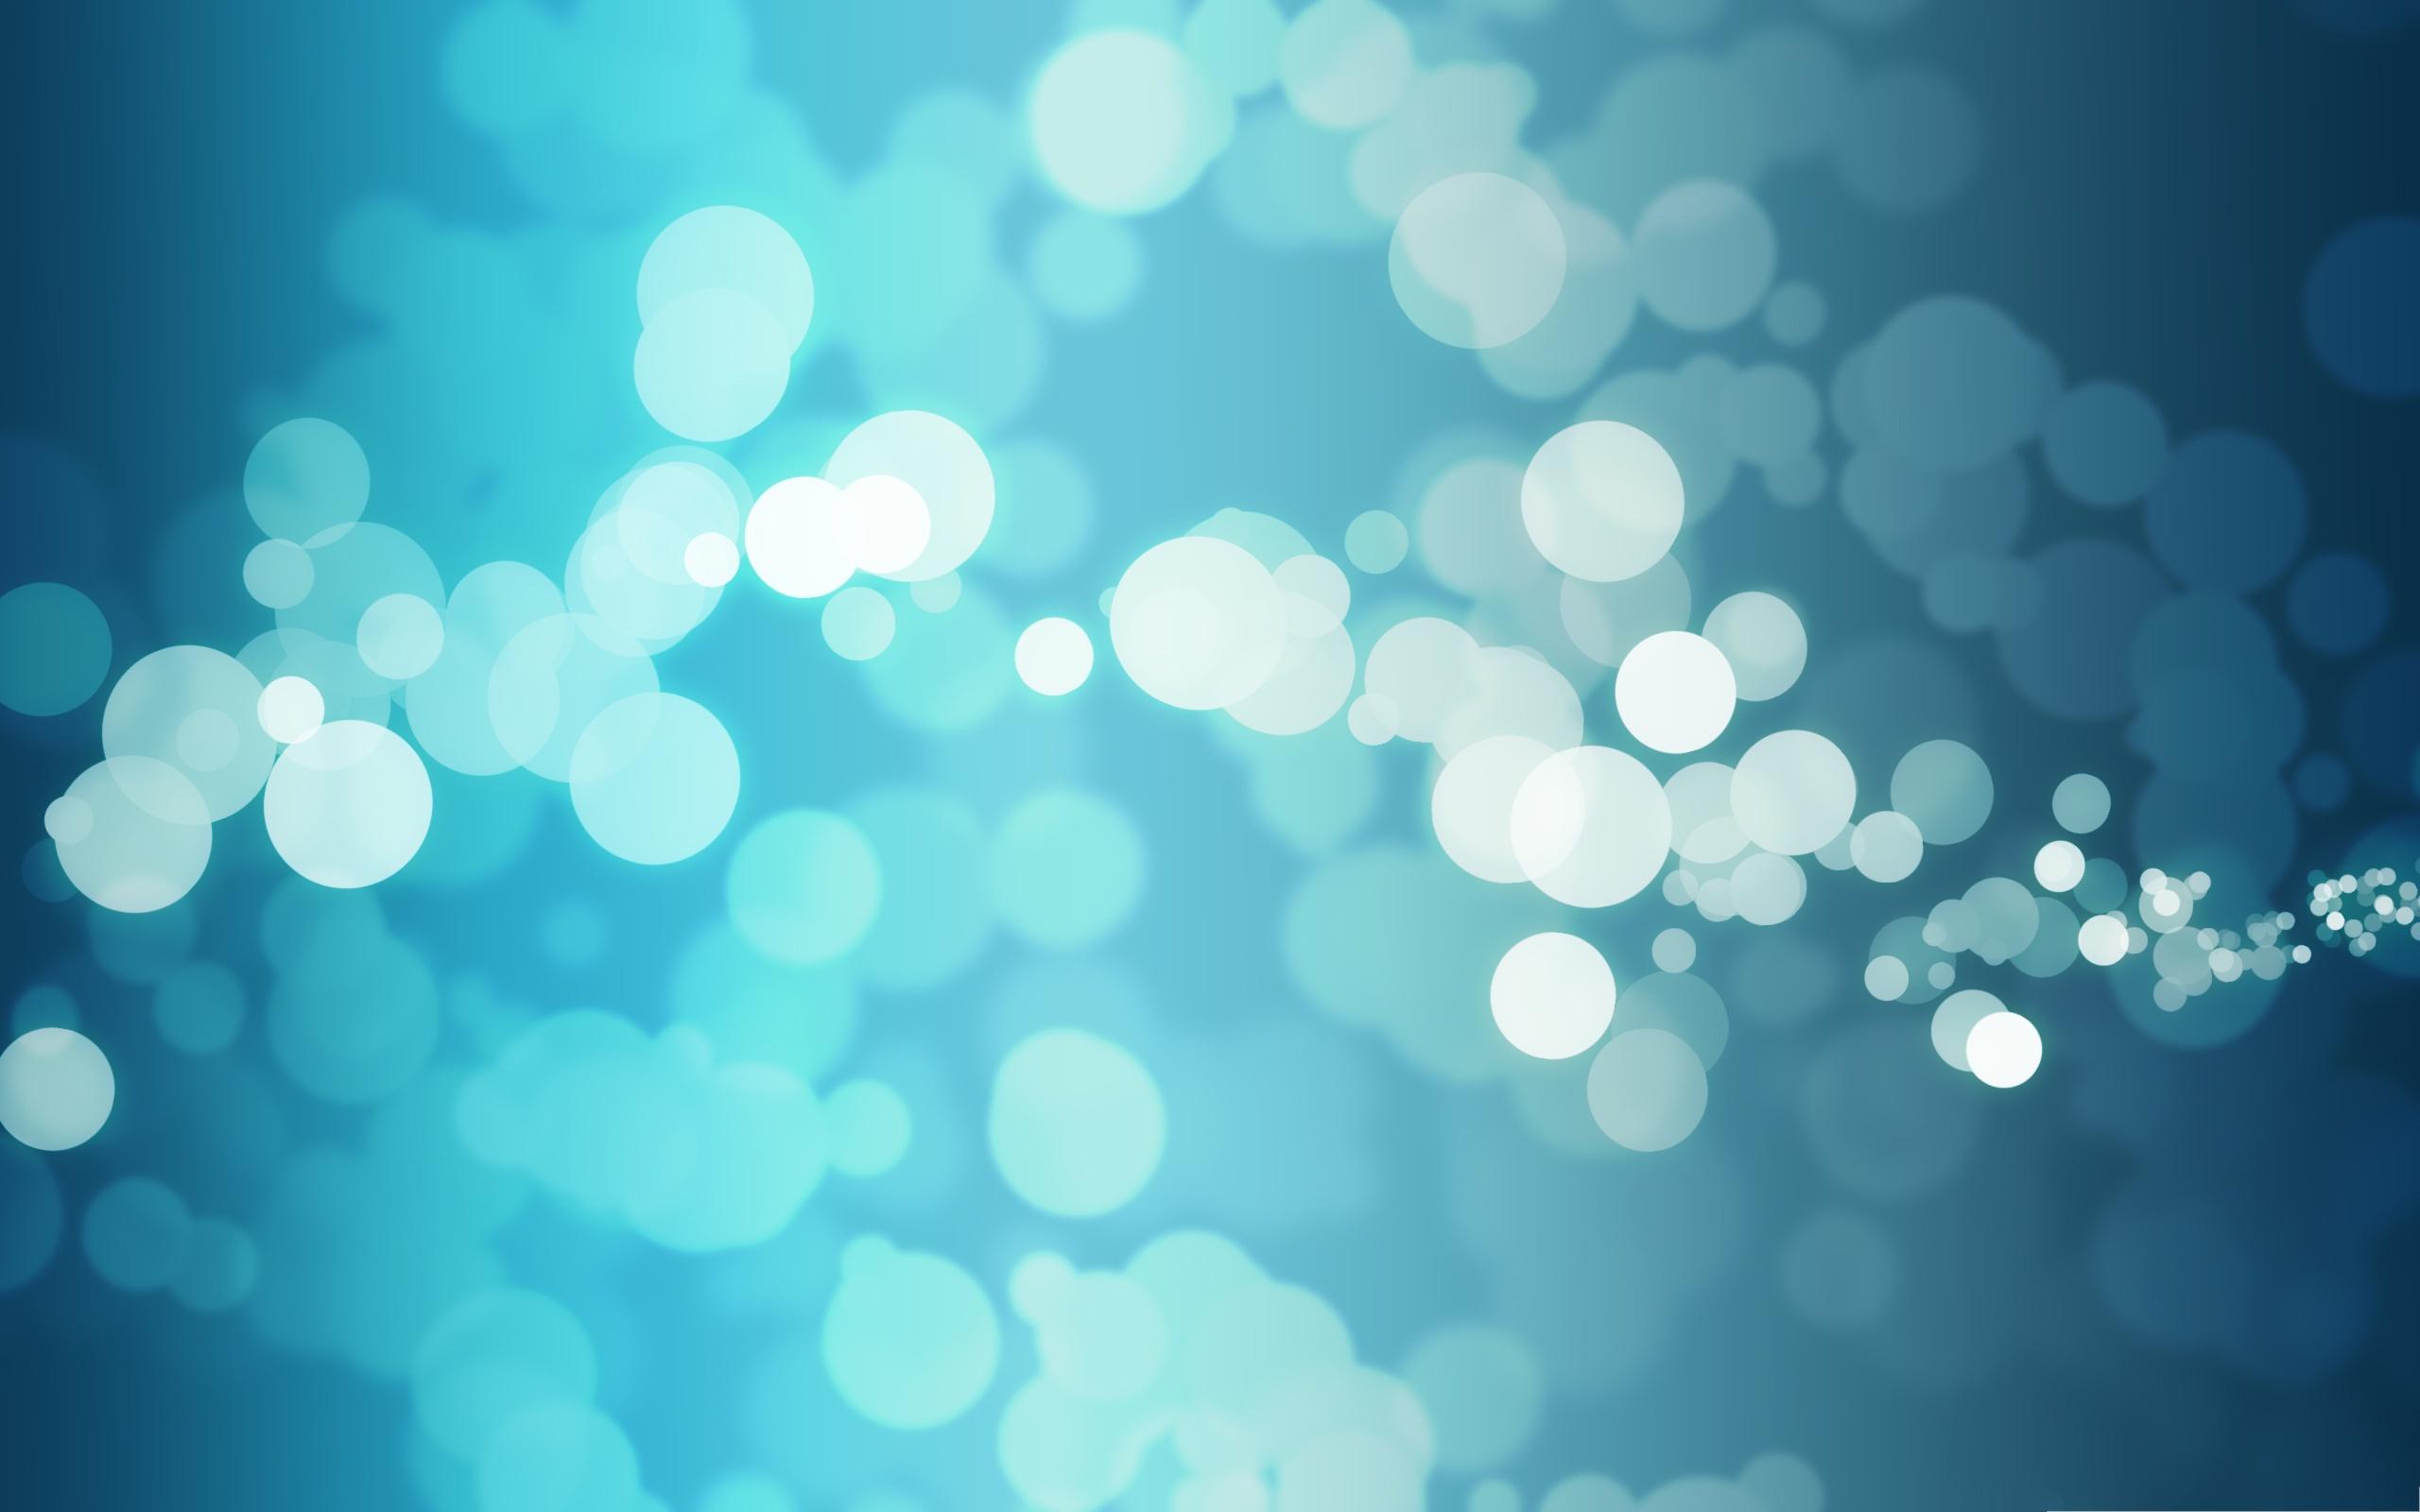 Free Blue Bubbles Wallpaper